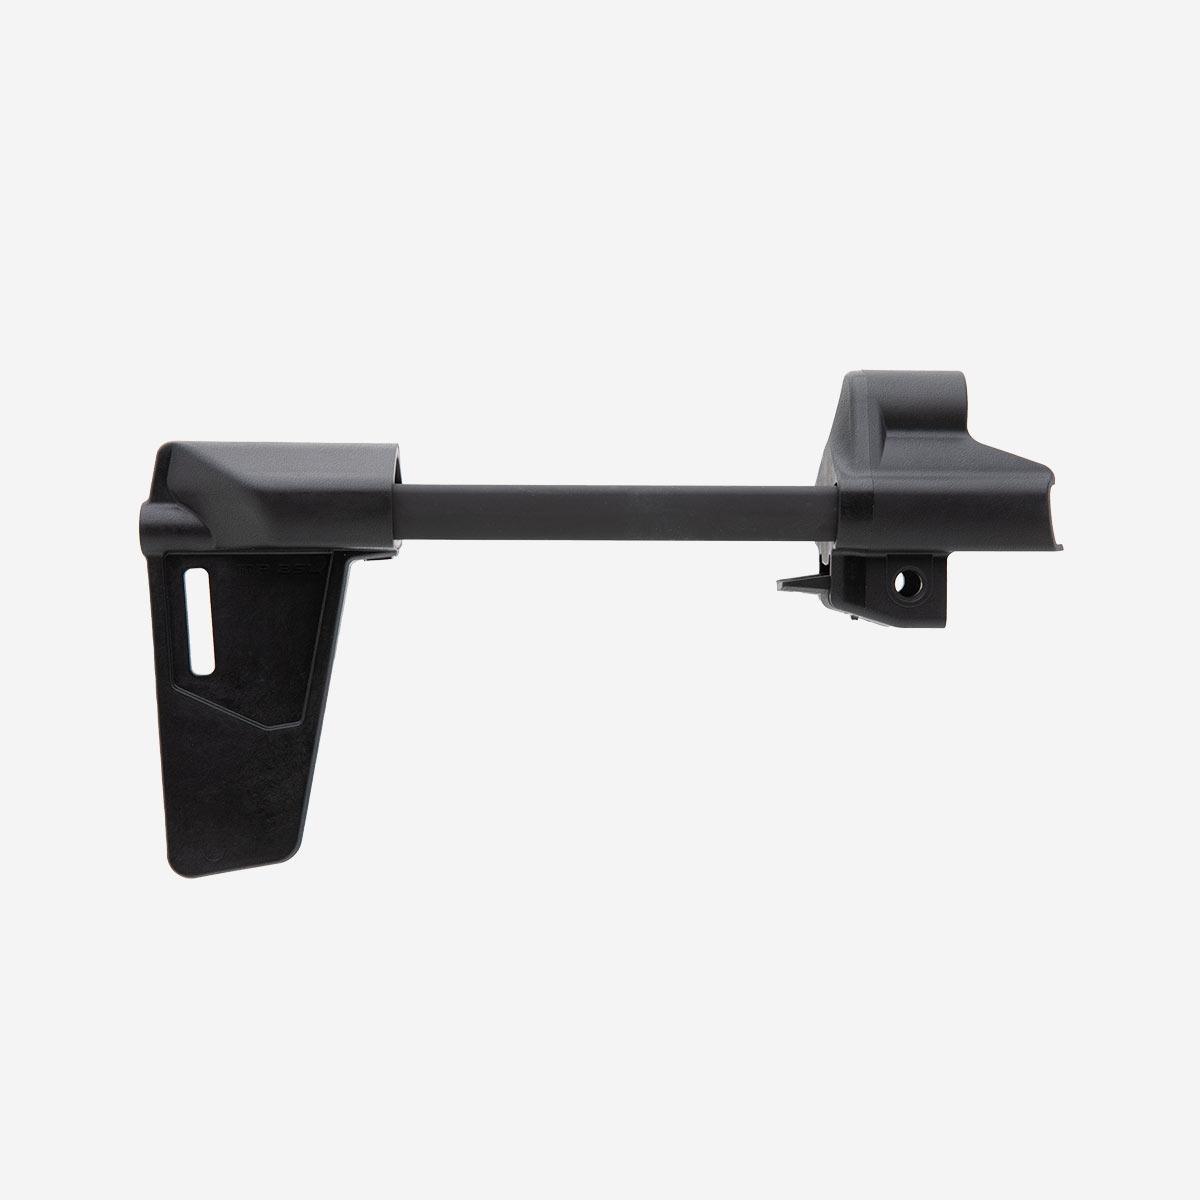 magpul Industries mp bsl arm brace mp5 pistol brace roller lock 9mm